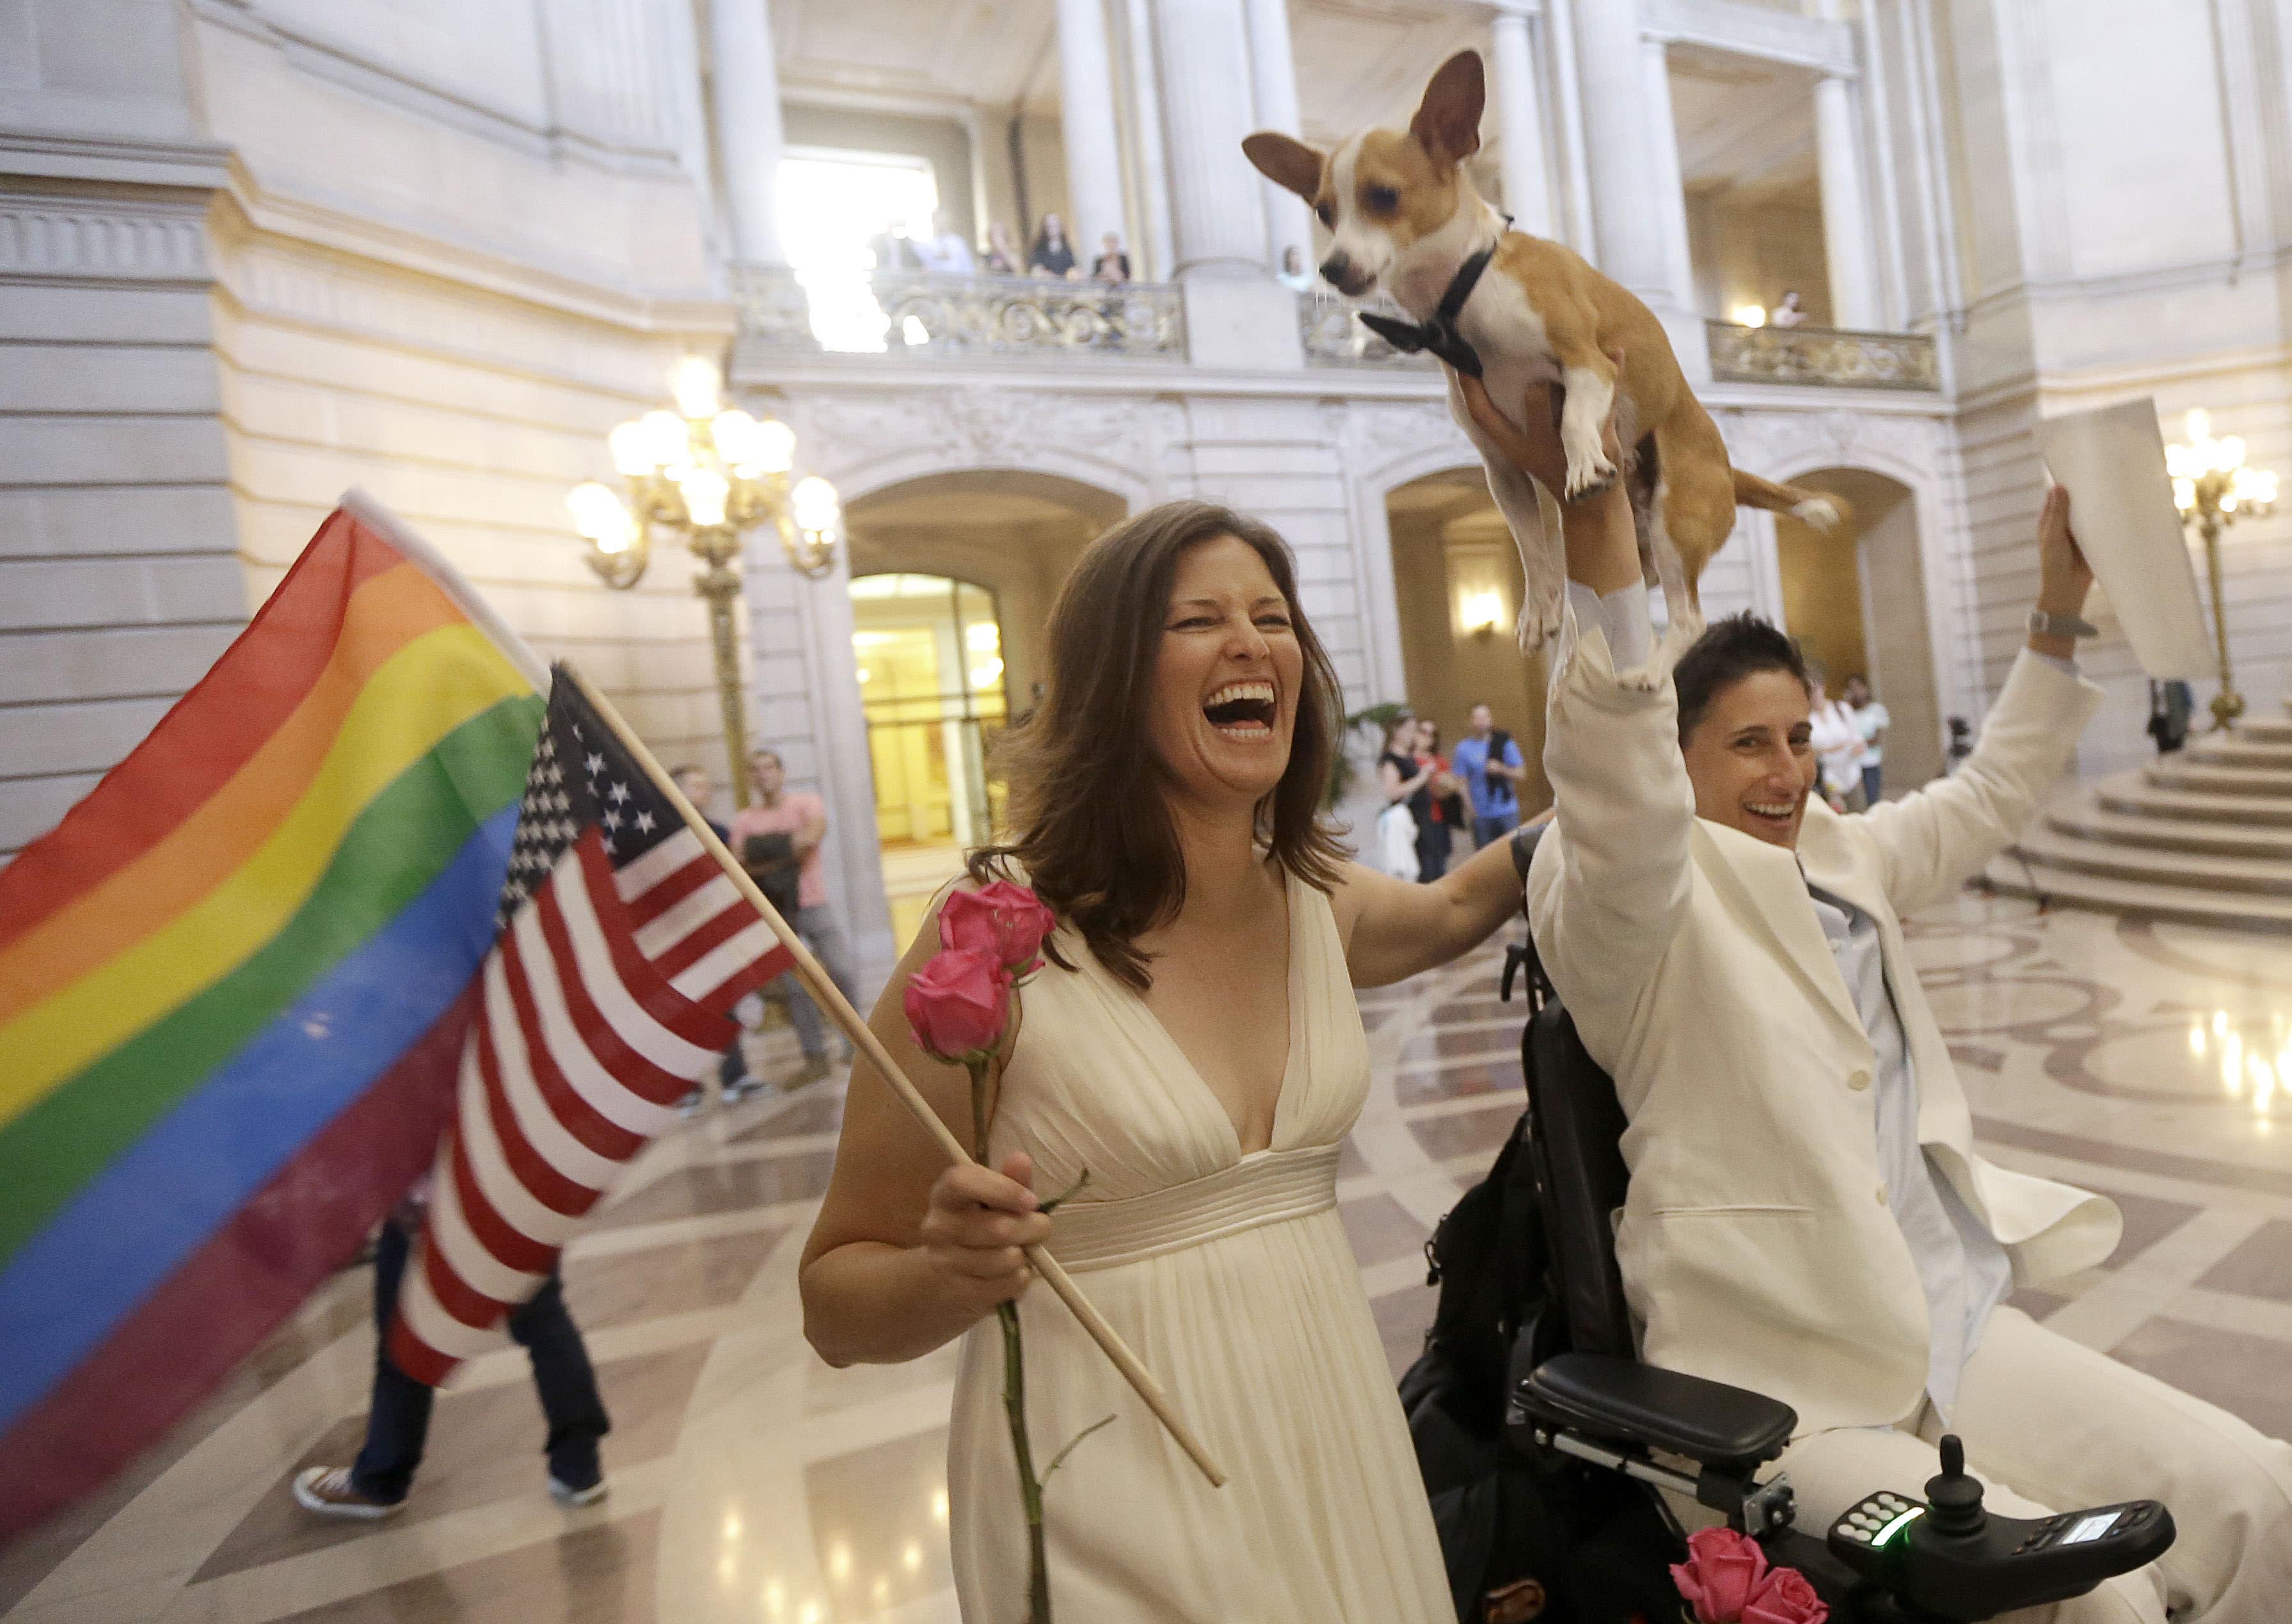 magistrates duty same sex marriage in Elizabeth